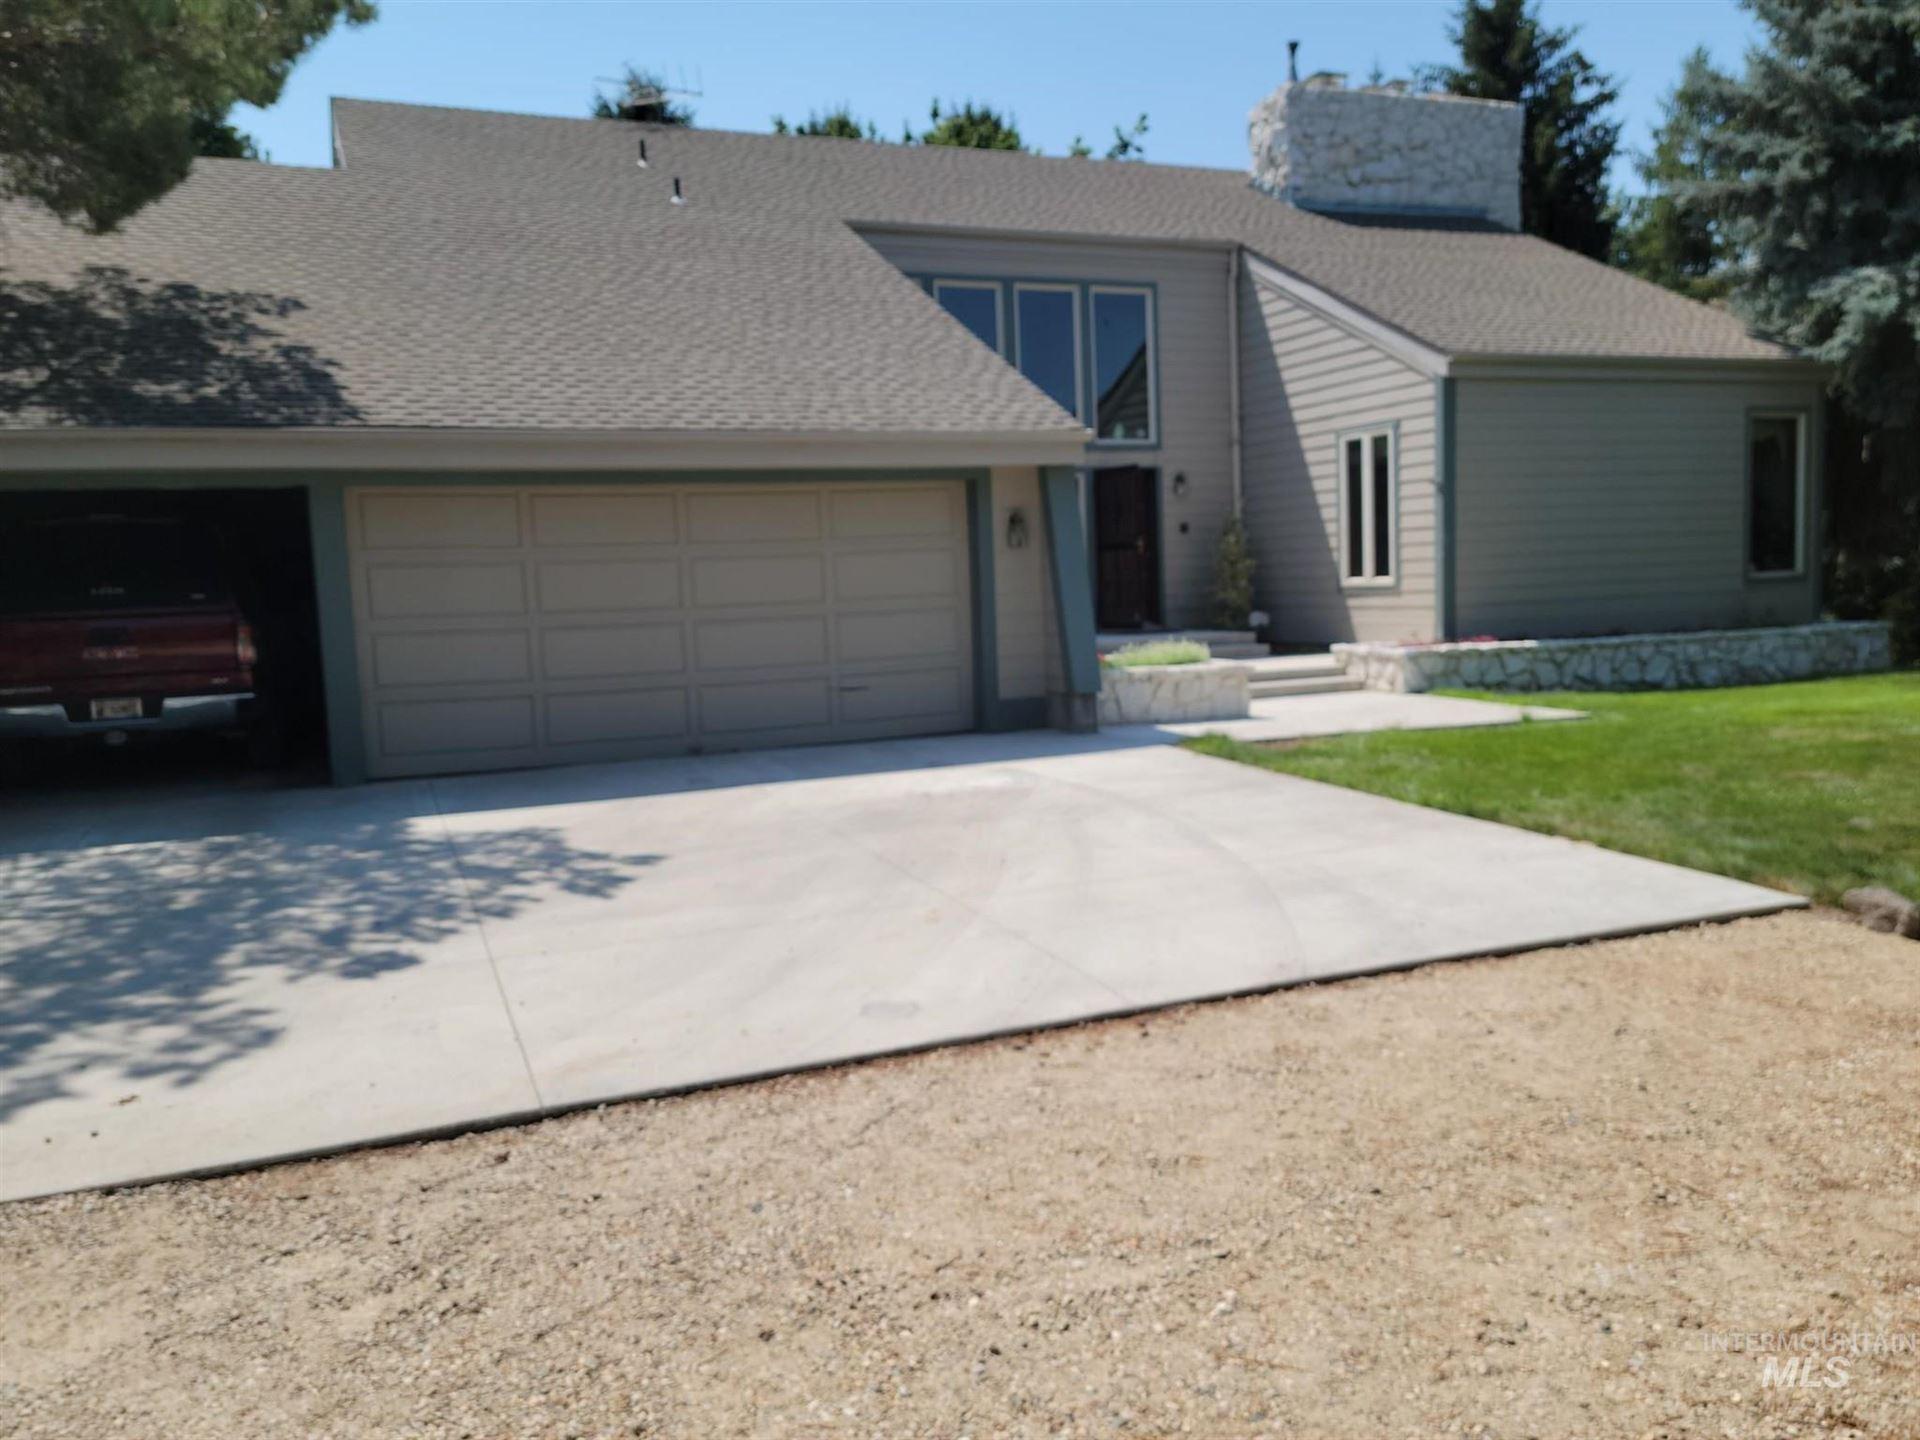 Photo of 3408 Dorman Ave, Caldwell, ID 83605 (MLS # 98813095)